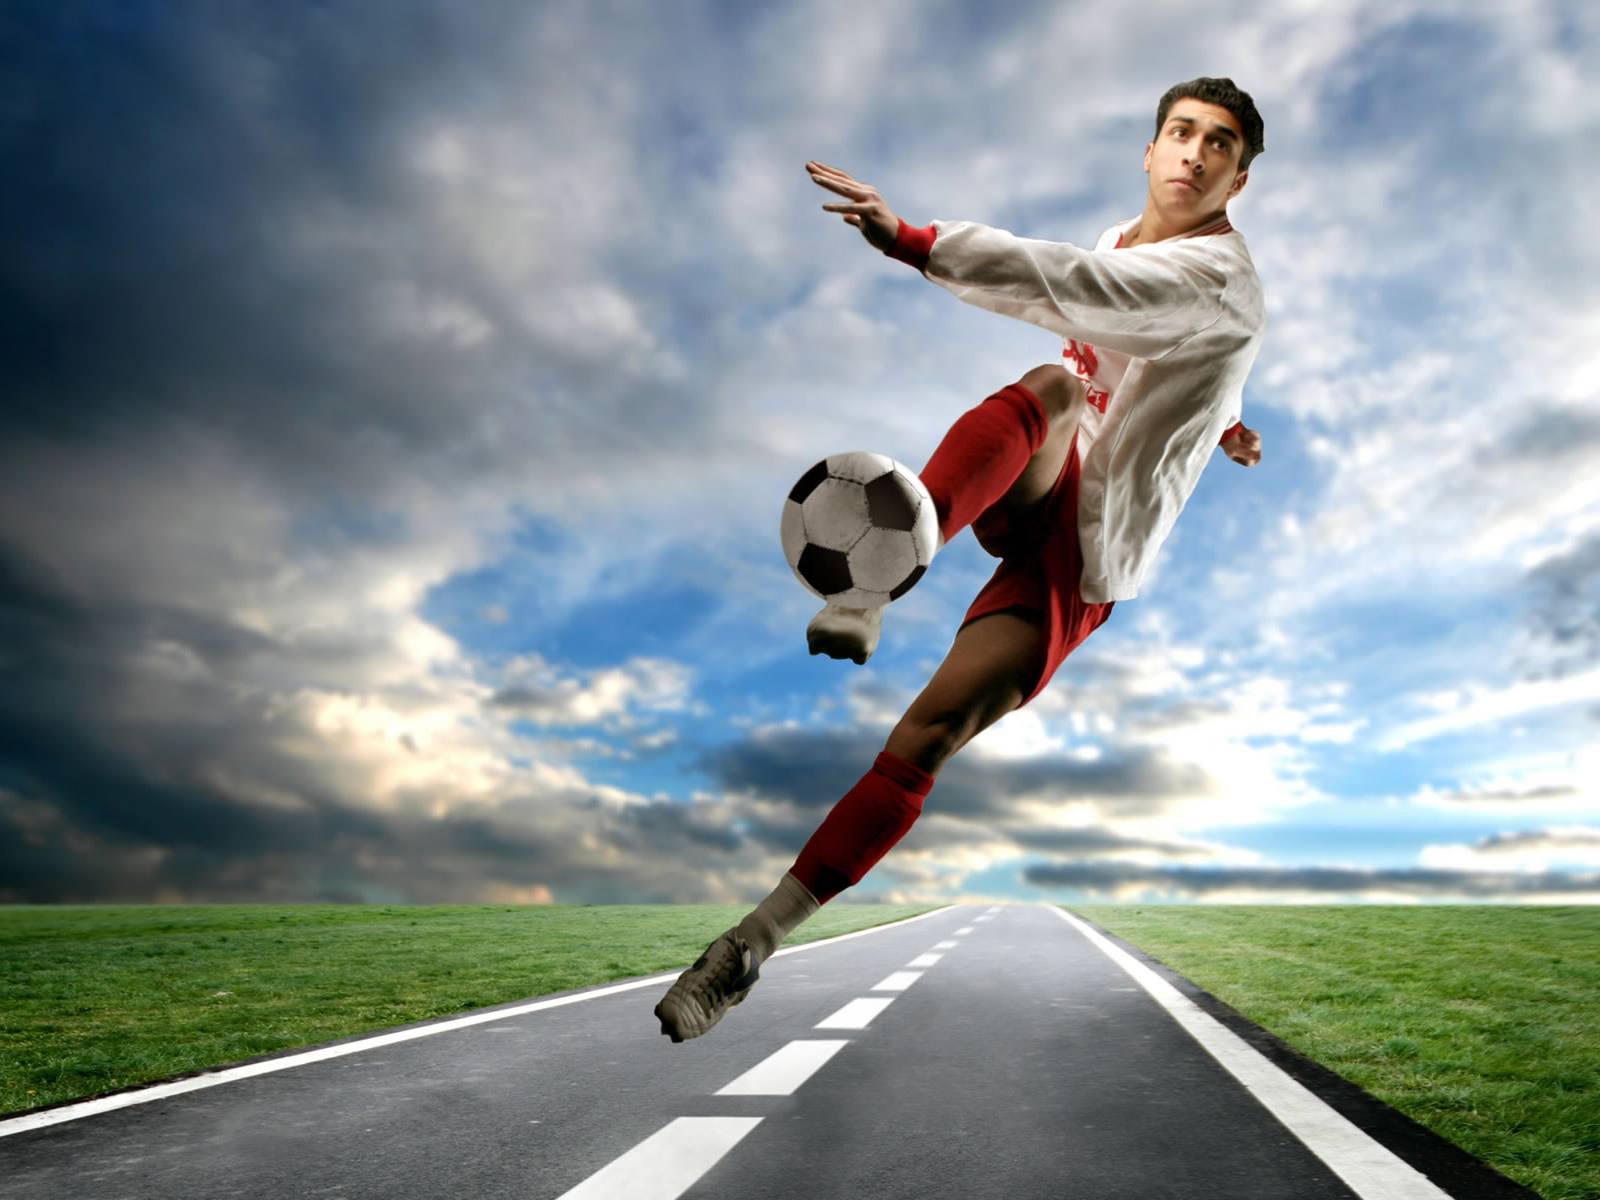 Footballer Wallpapers - Image Wallpapers